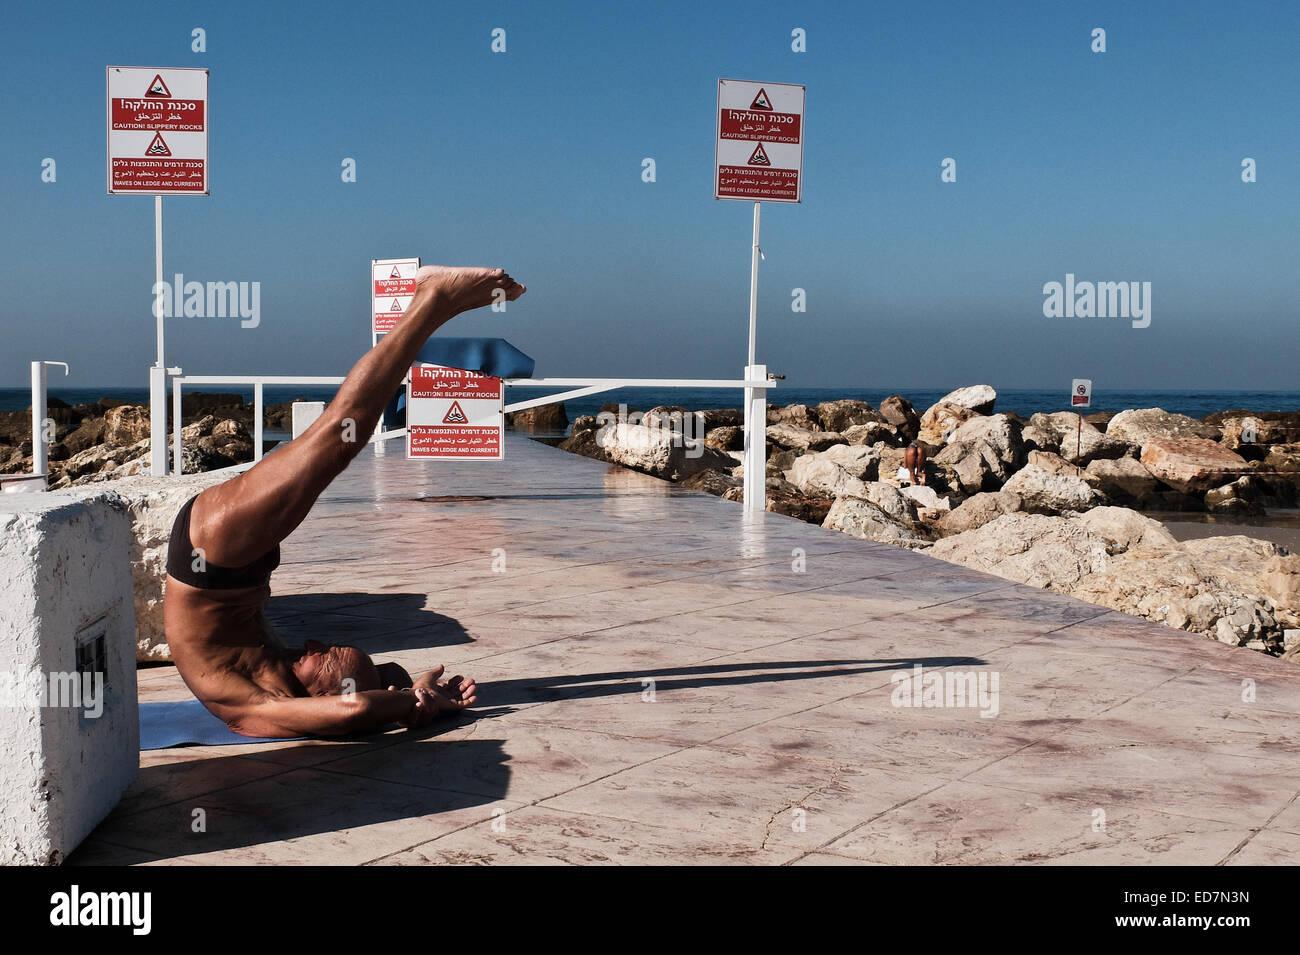 Tel-Aviv, Israel. 31st Dec, 2014. A man exercises at the Hilton Beach. Twenty-two Degrees Centigrade were recorded - Stock Image